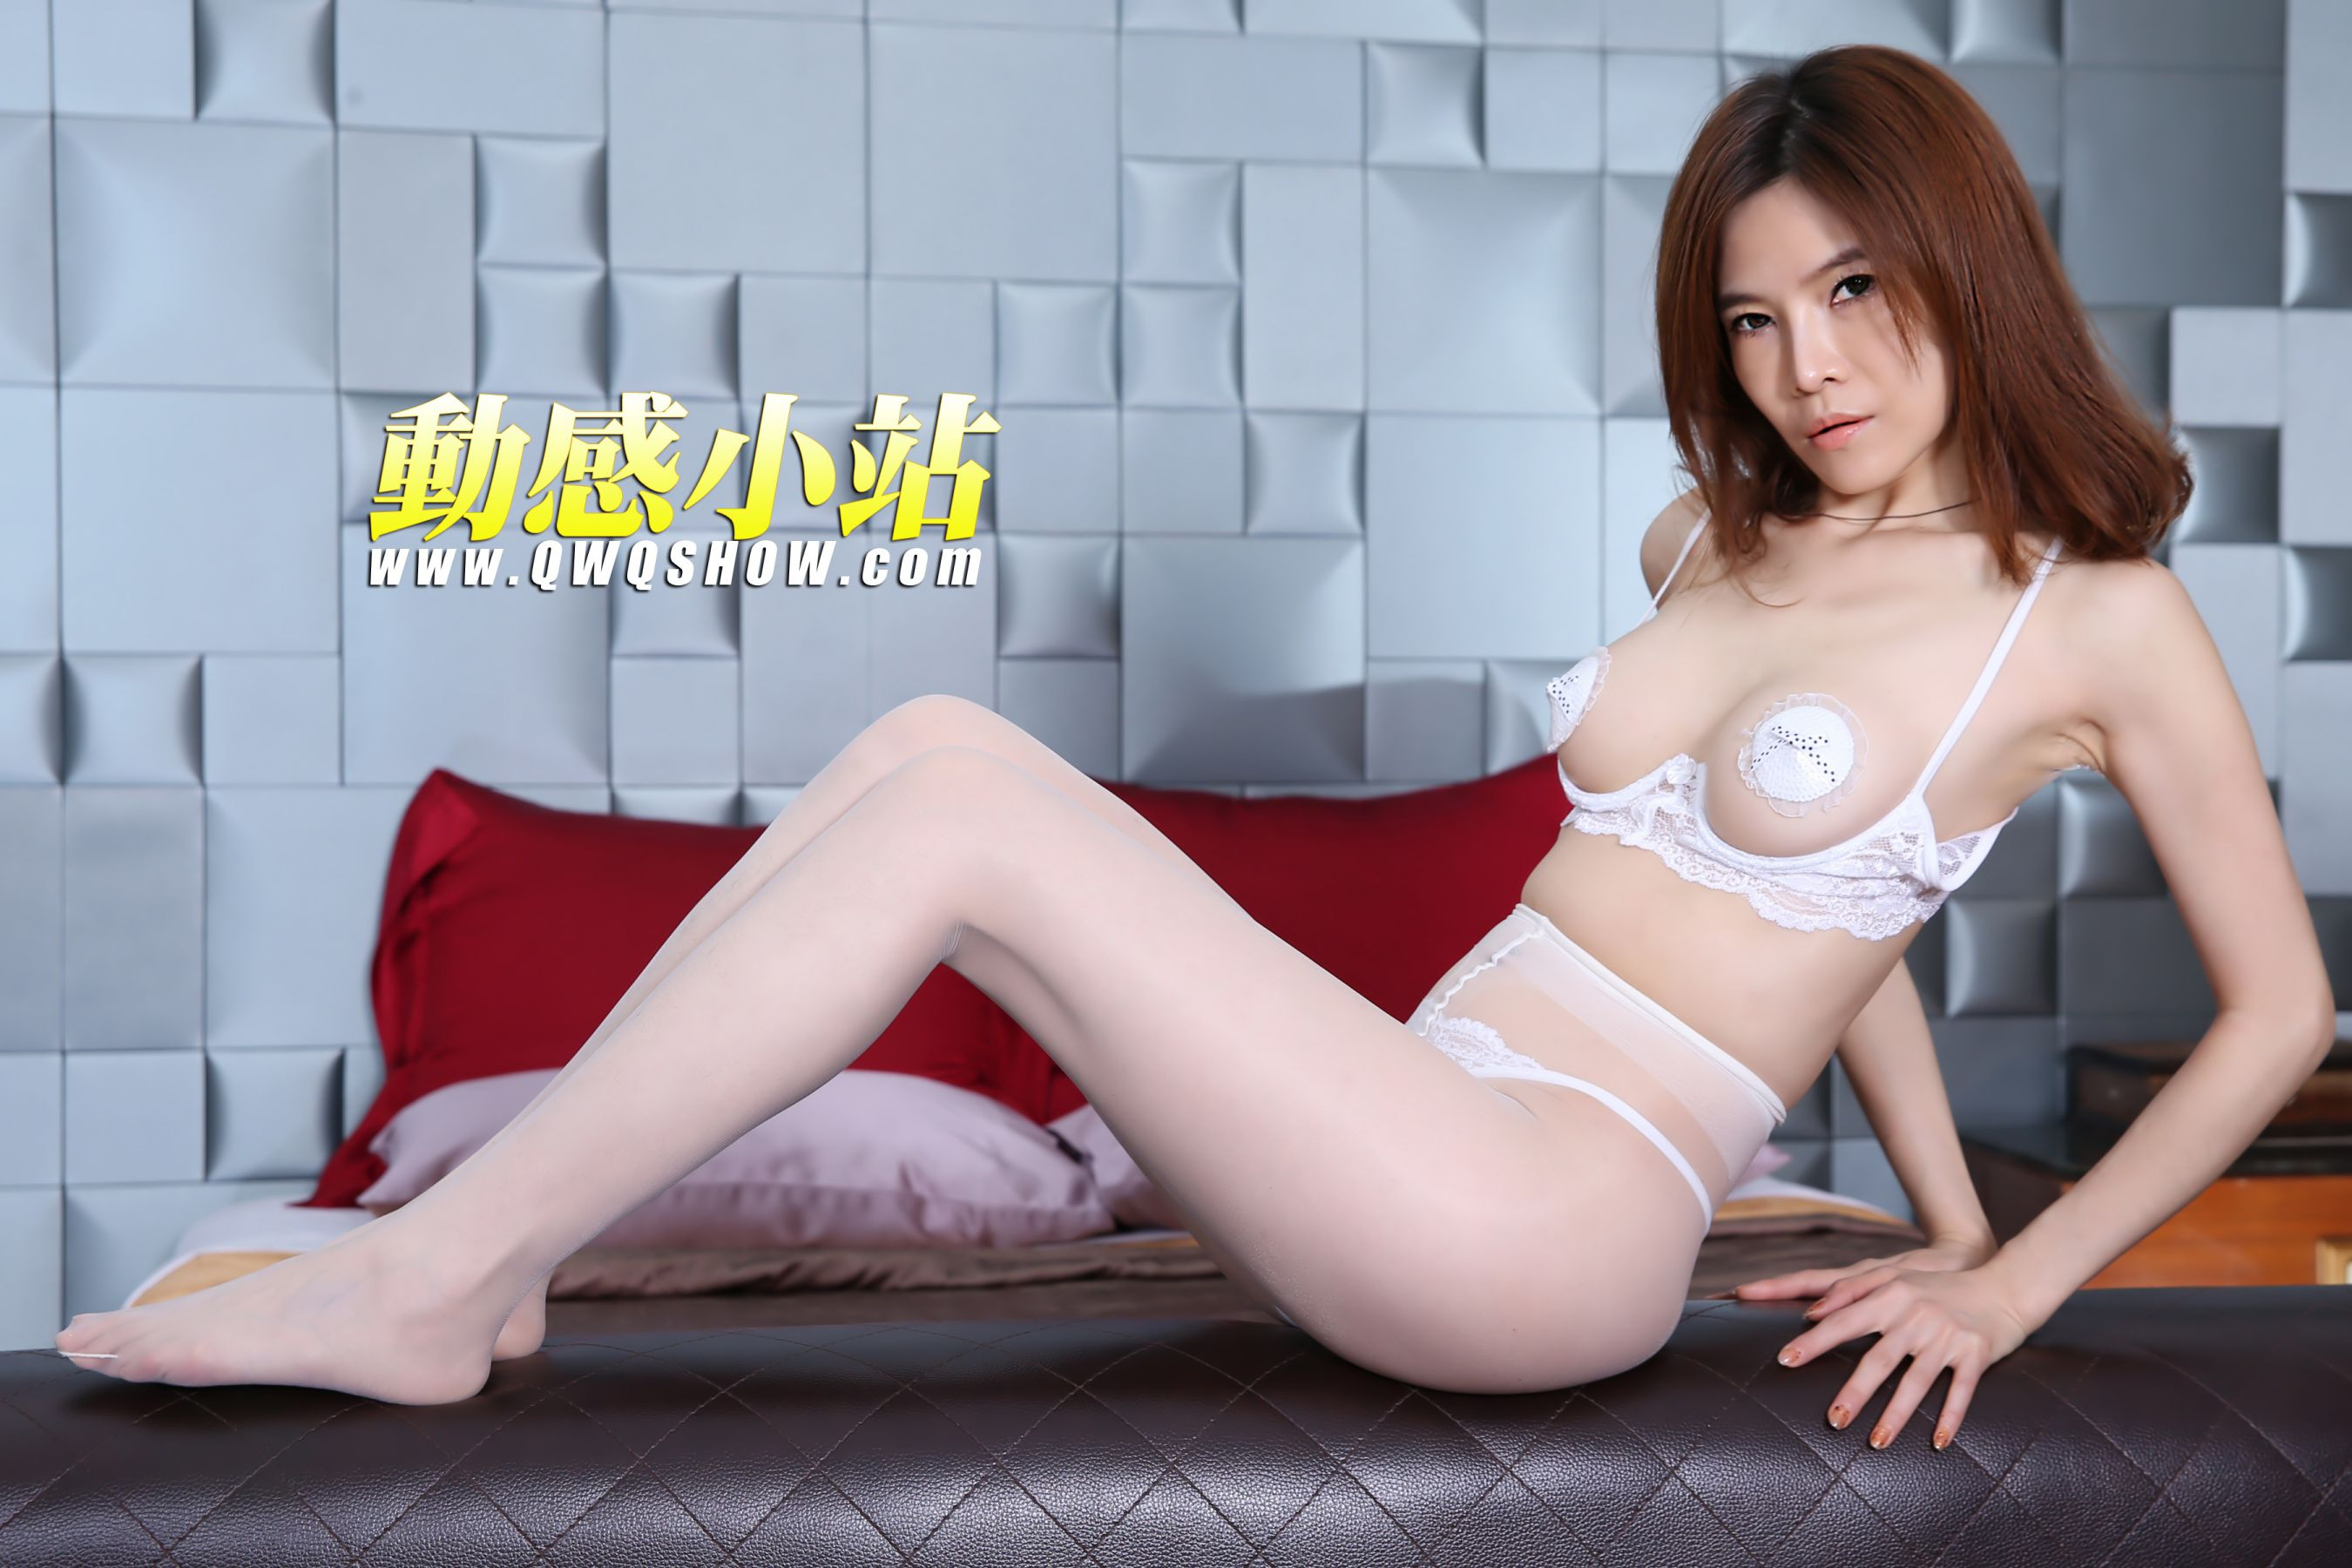 VOL.919 [动感之星]白丝少妇美臀少妇:小玲(动感小站小玲,动感之星小玲)高品质写真套图(43P)